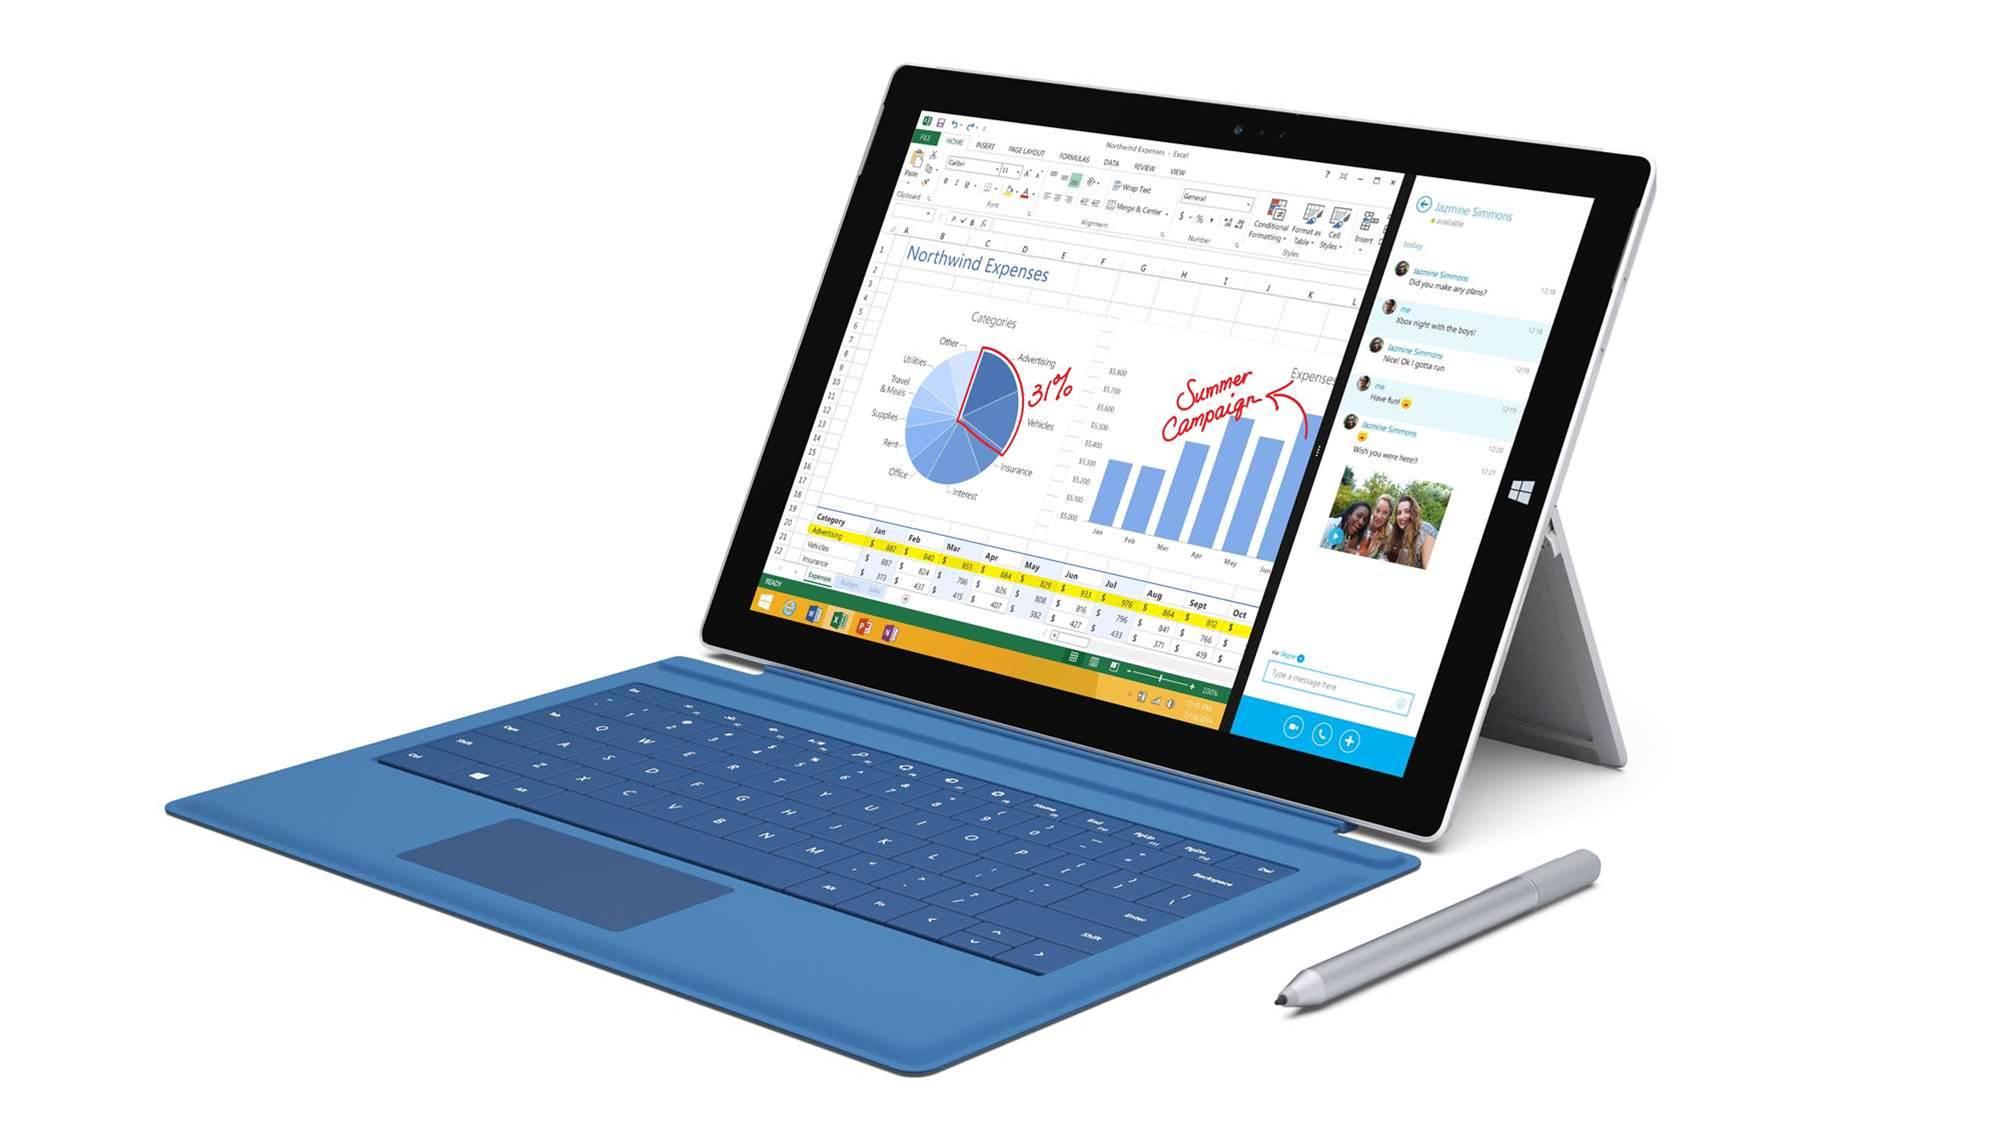 Microsoft unveils Surface Pro 3